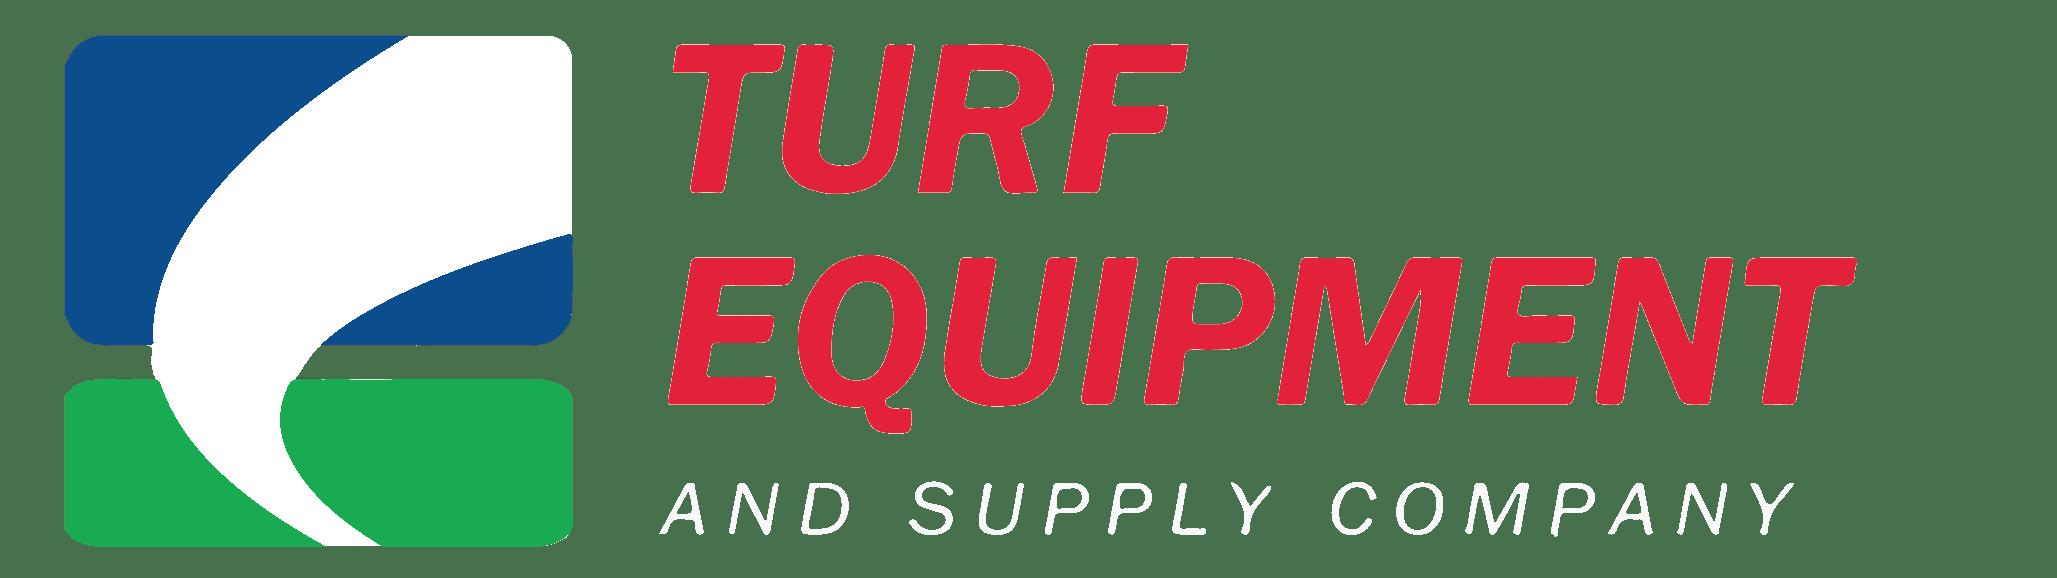 Company logo for 'Turf Equipment and Supply Company'.